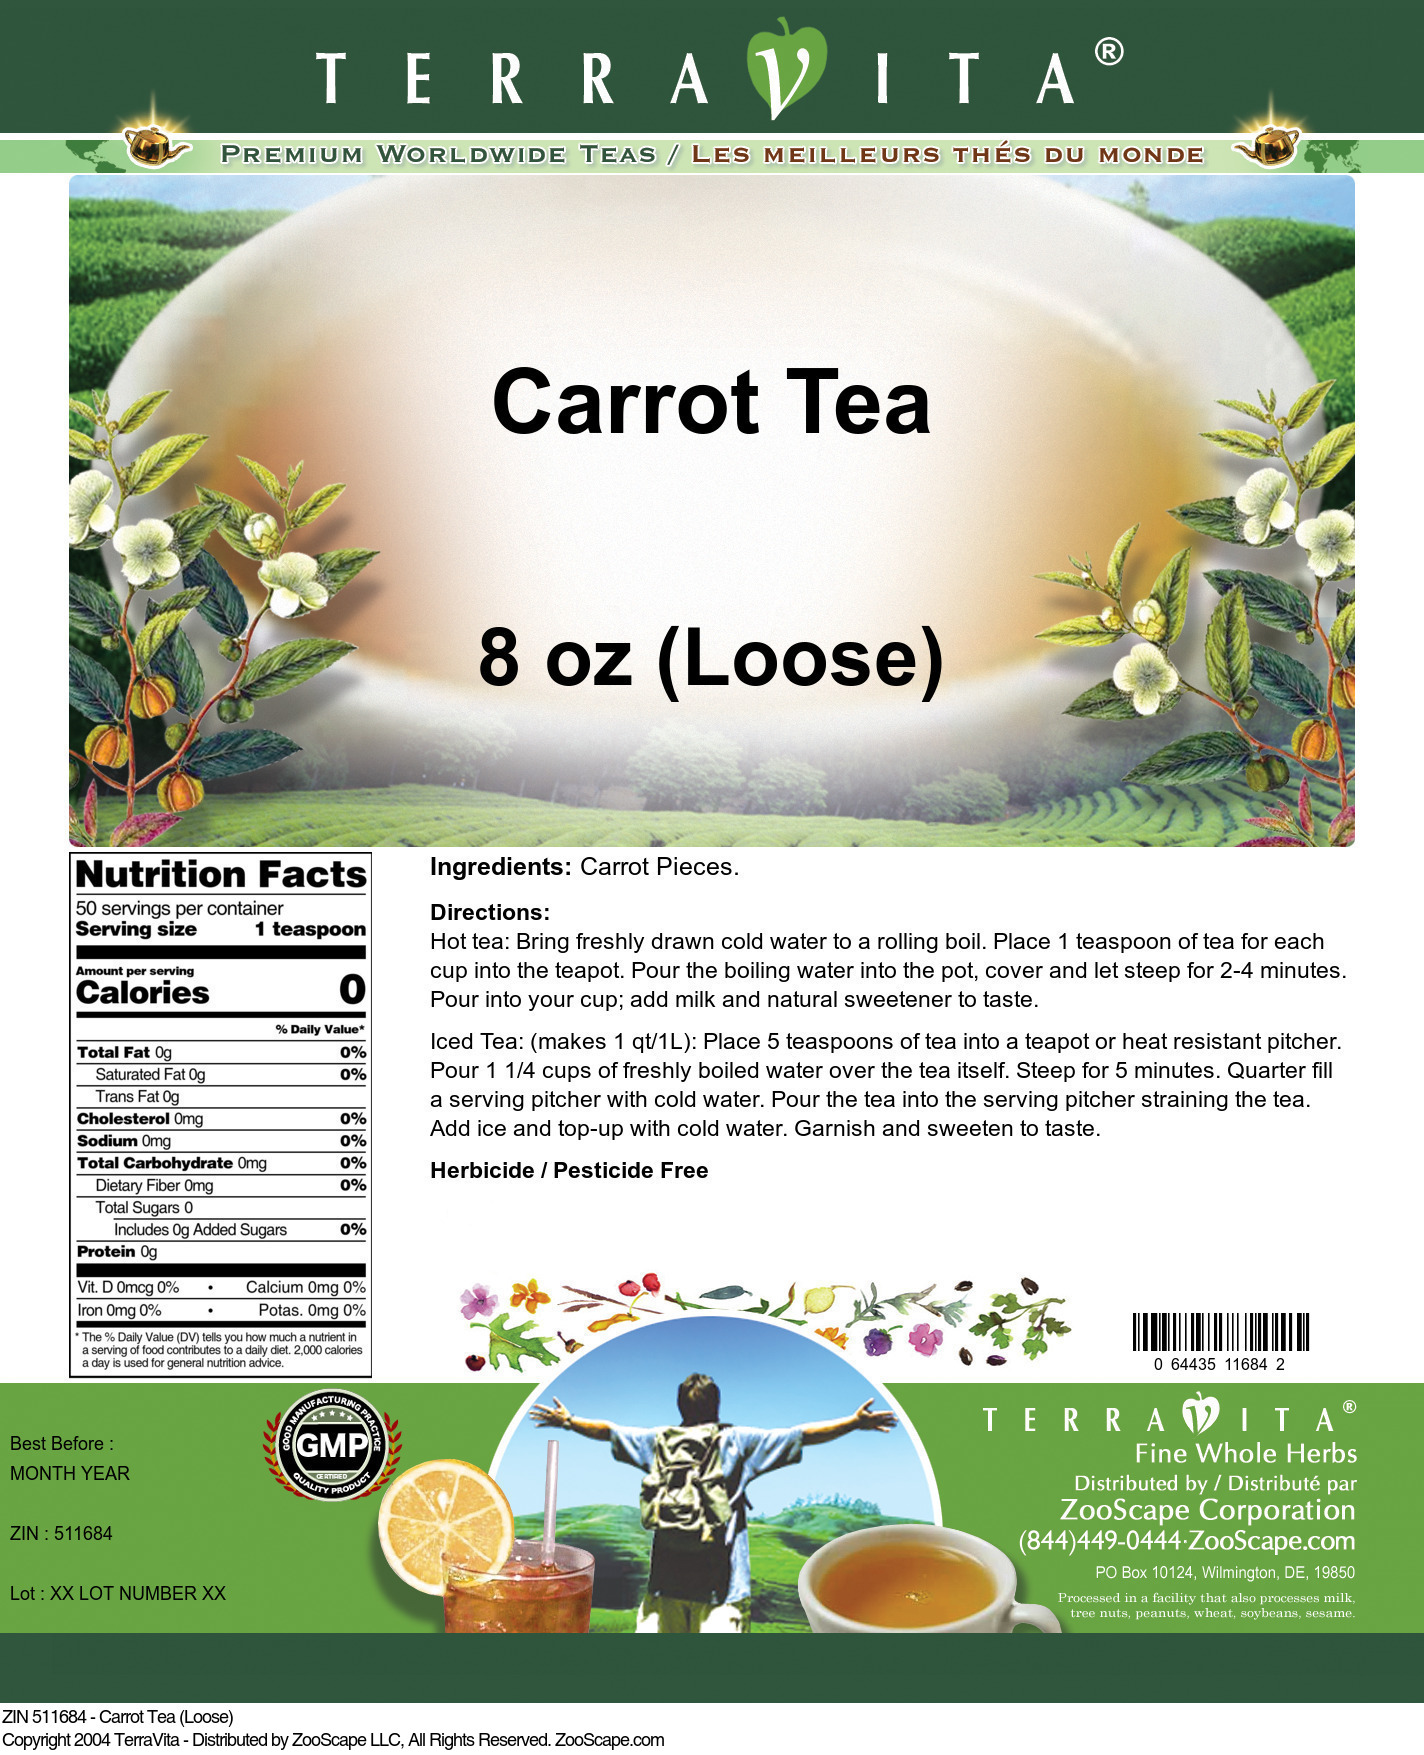 Carrot Tea (Loose)